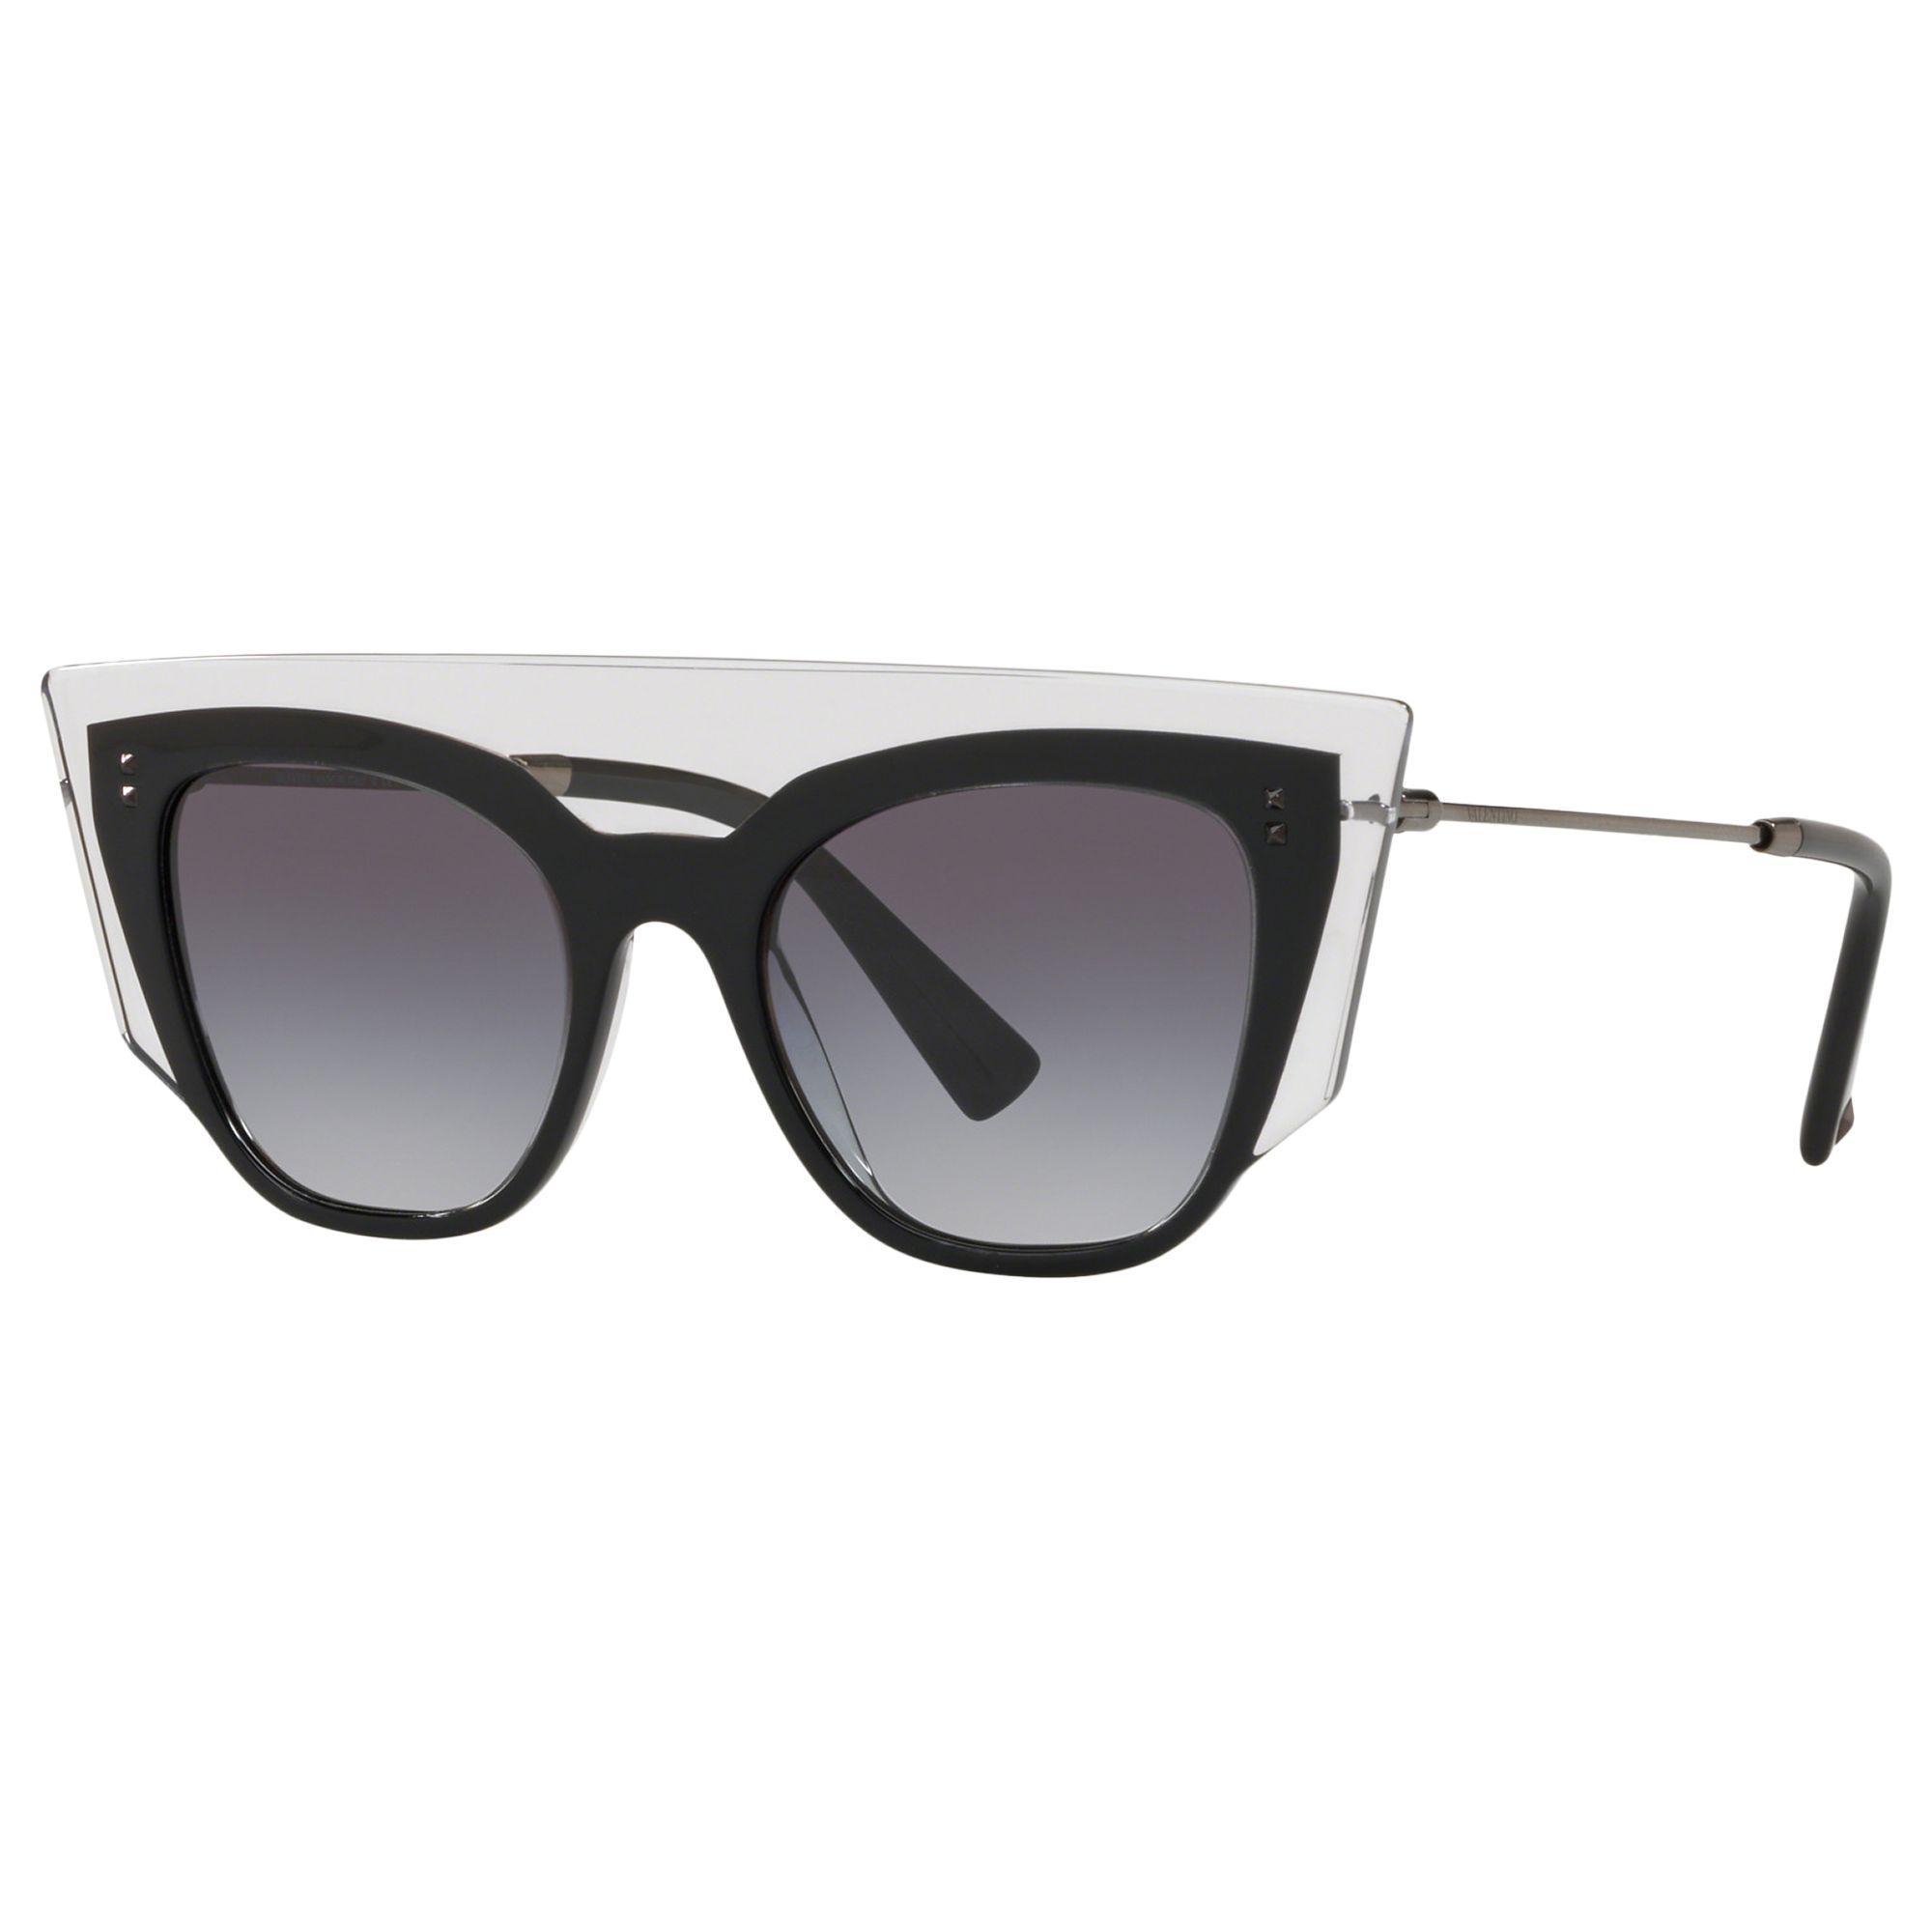 5963e7ad5f Valentino. Va4035 Women s Square Sunglasses. £239 From John Lewis and  Partners